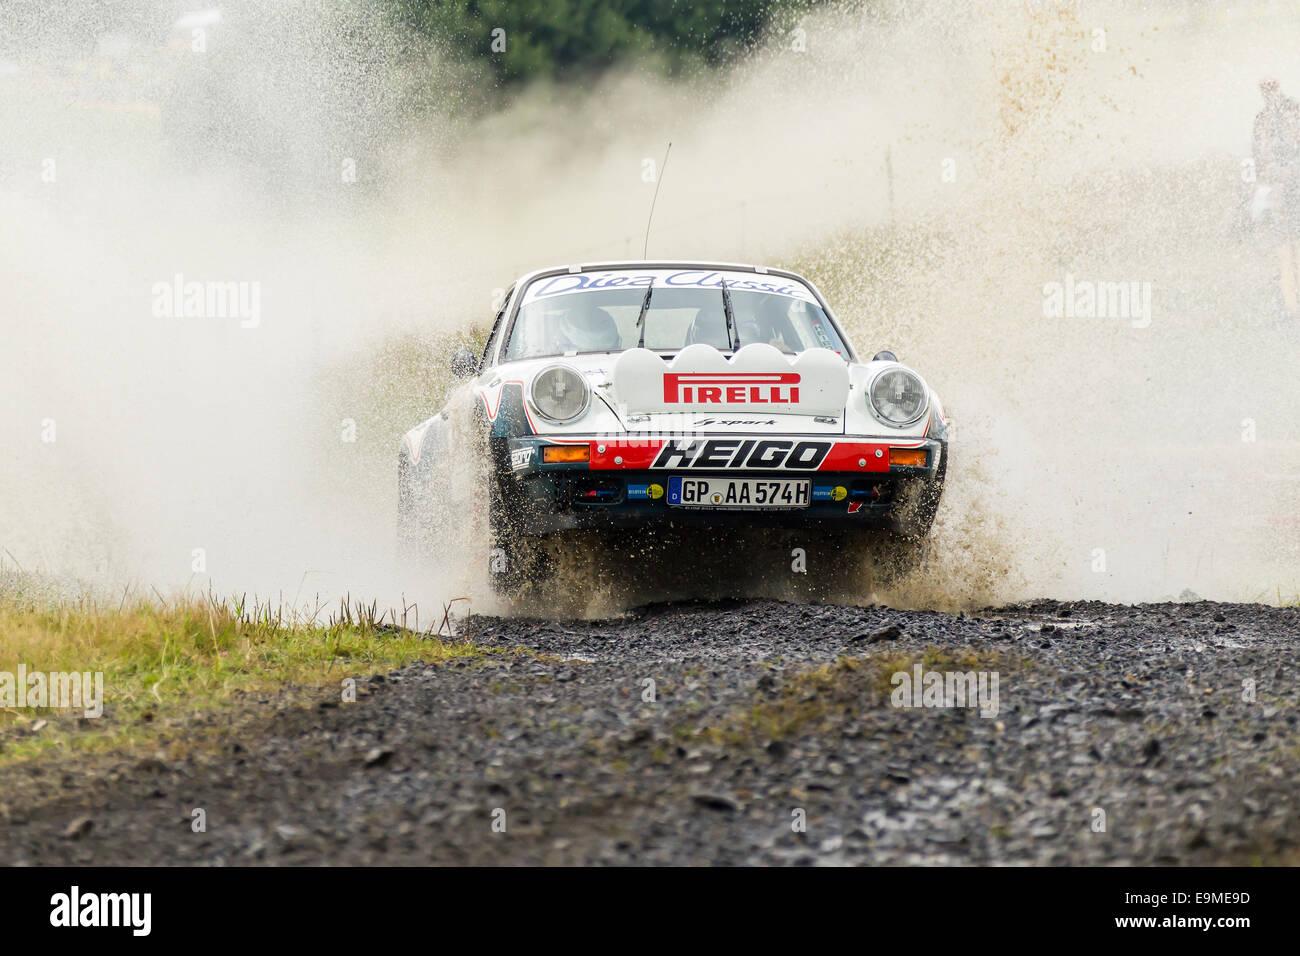 Oldtimer Eifel Rallye Festival 2014, crossing a water hole, WP 1 Bosch Super Stage, Porsche 911, Daun, Vulkaneifel, - Stock Image